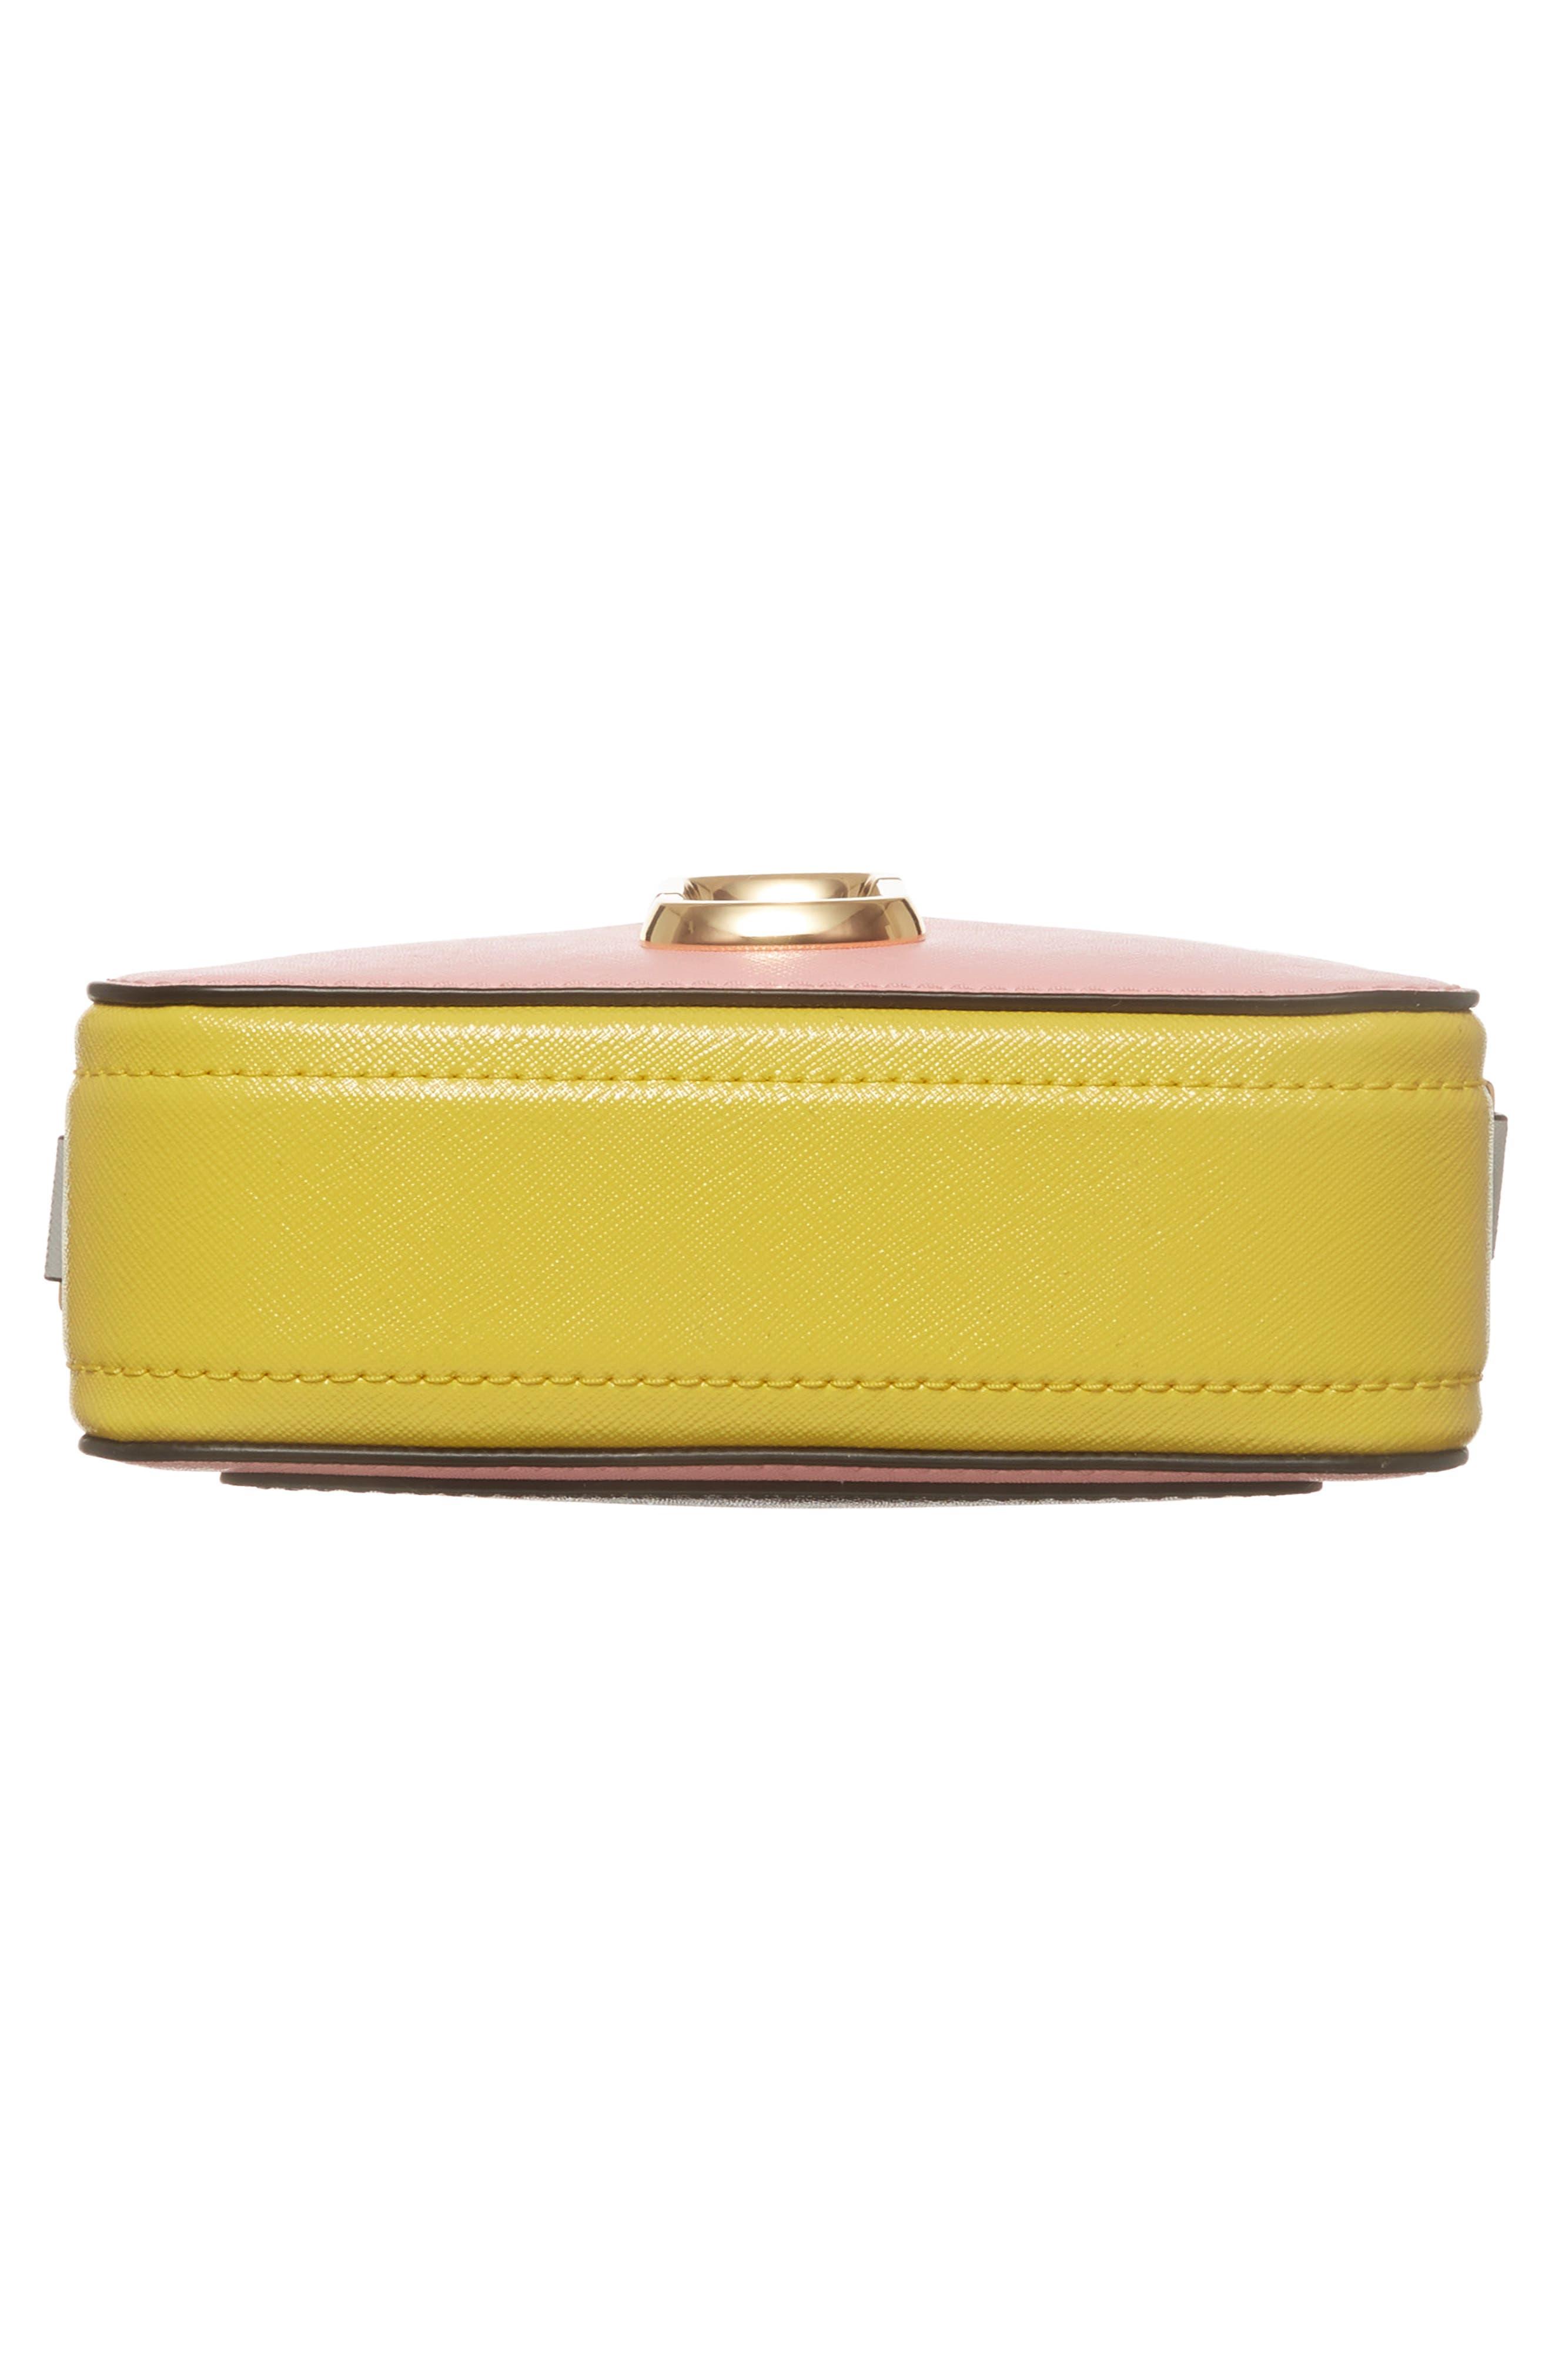 Snapshot Crossbody Bag,                             Alternate thumbnail 6, color,                             Baby Pink Multi